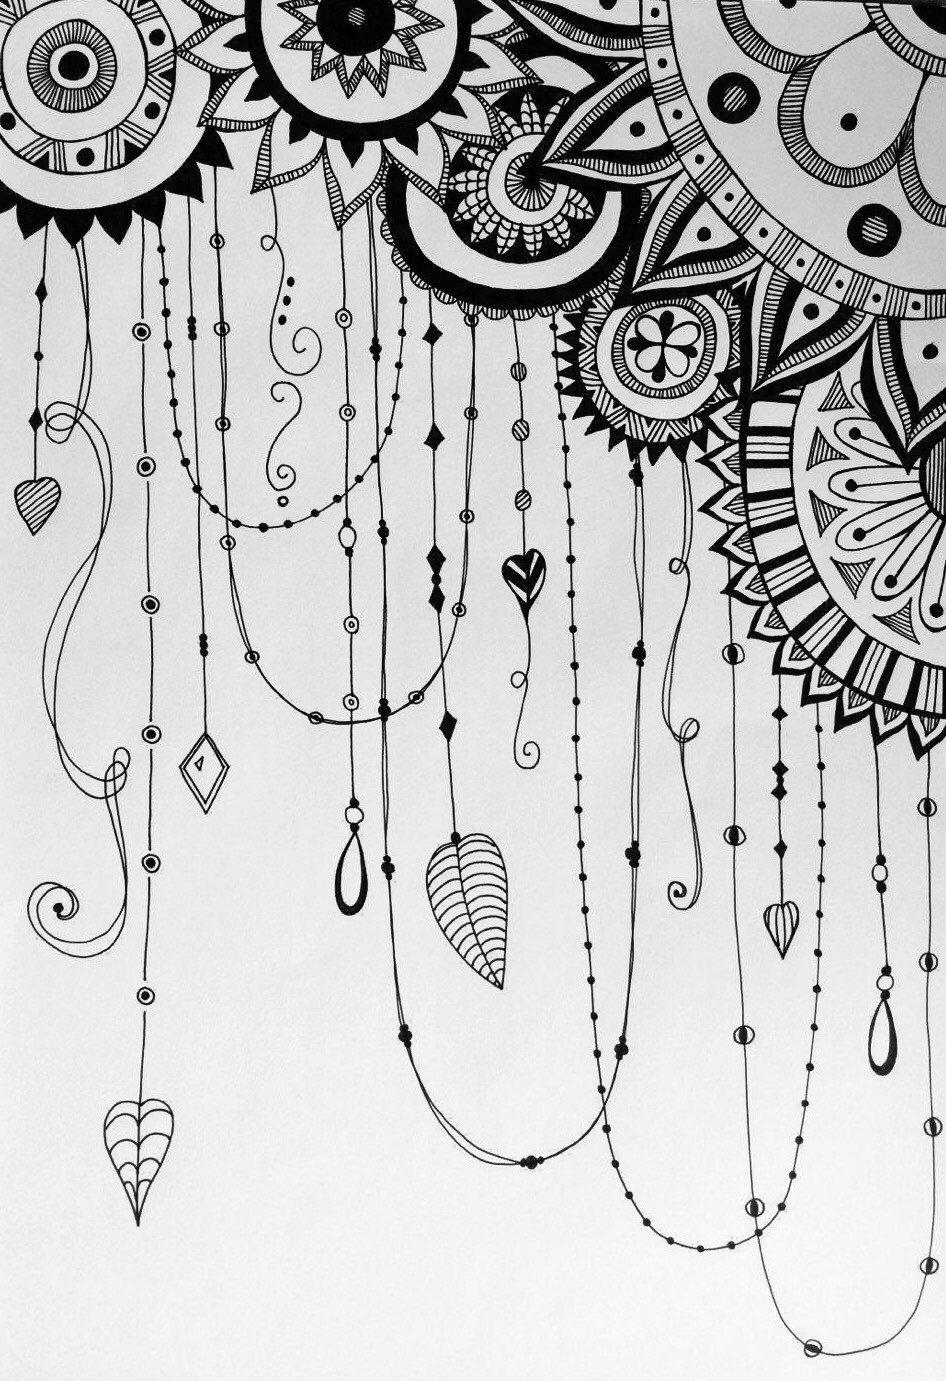 Photo of Hand drawn dreamcatcher variation zentangle doodle